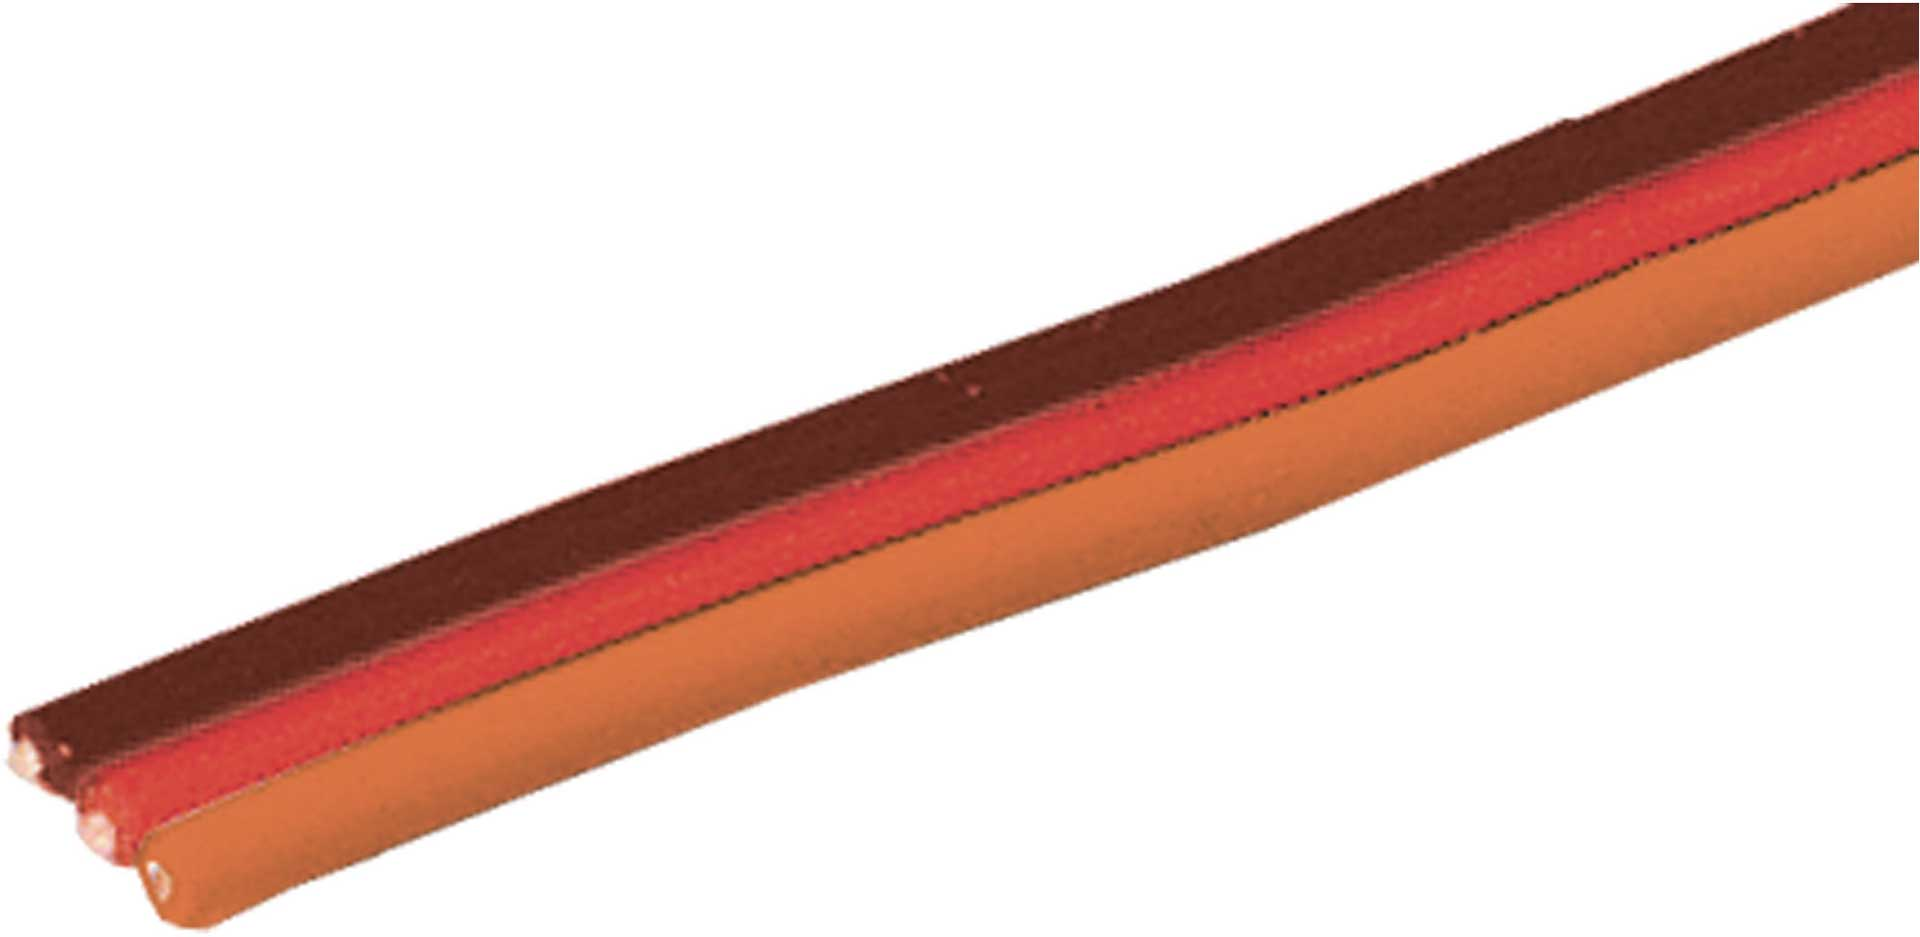 Robbe Modellsport Servokabel Graupner/JR/Uni 100 Meter flach 0,13mm² (26AWG) PVC Meterware